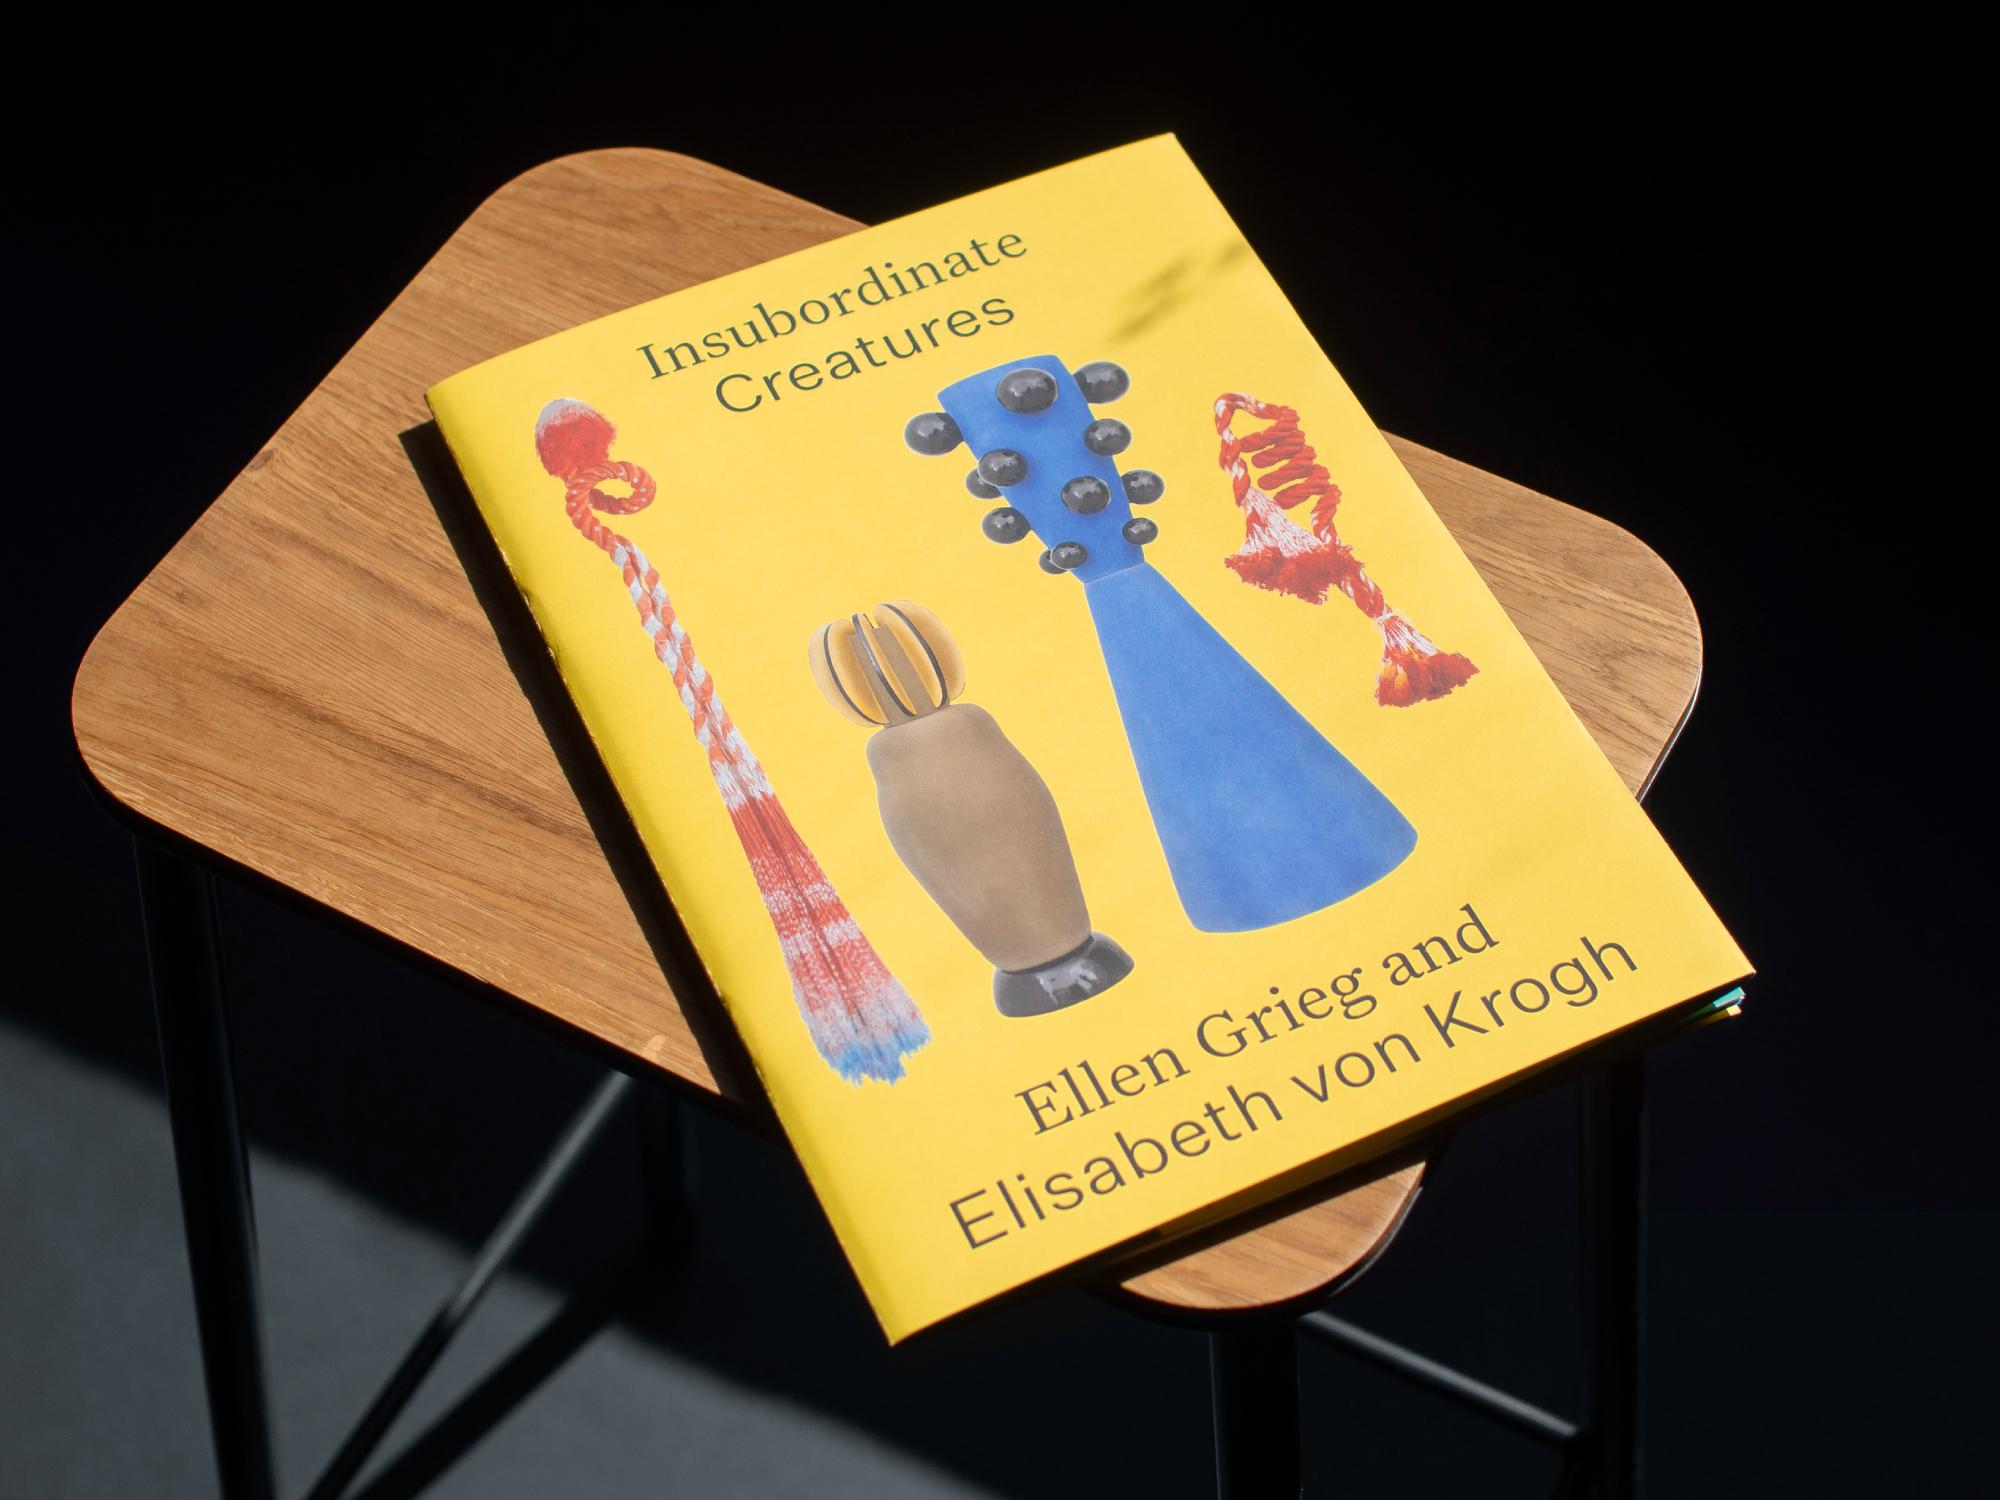 Cover image: Insubordinate Creatures, Catalogue